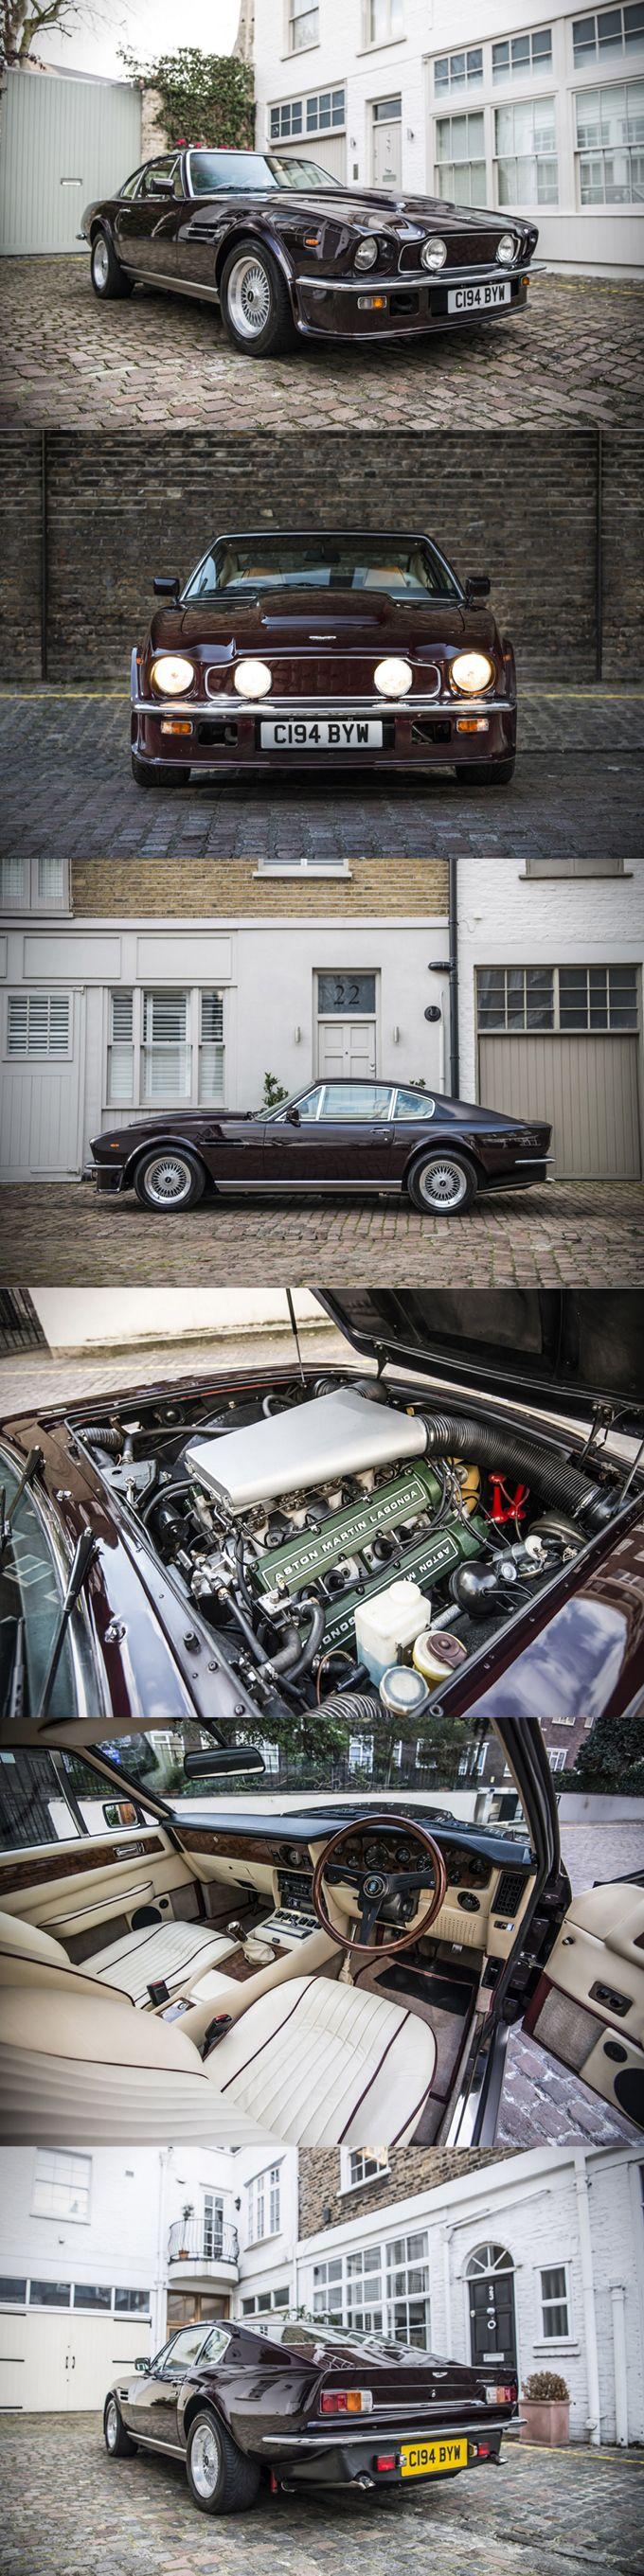 1985 Aston Martin V8 Vantage Elton John / Royal Cherry red / UK / 17-204